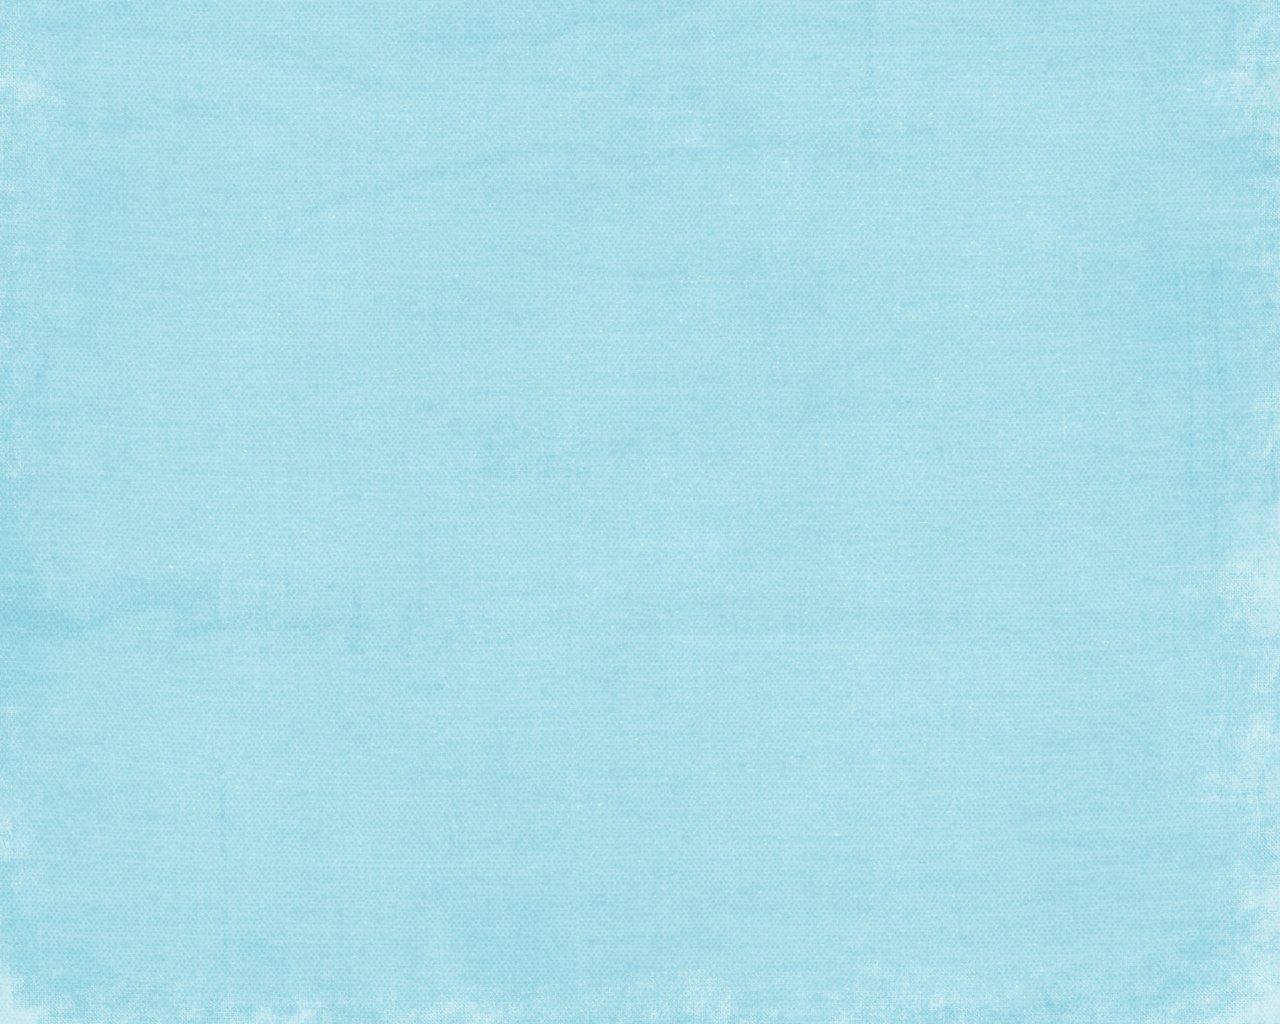 Ткань текстура голубая